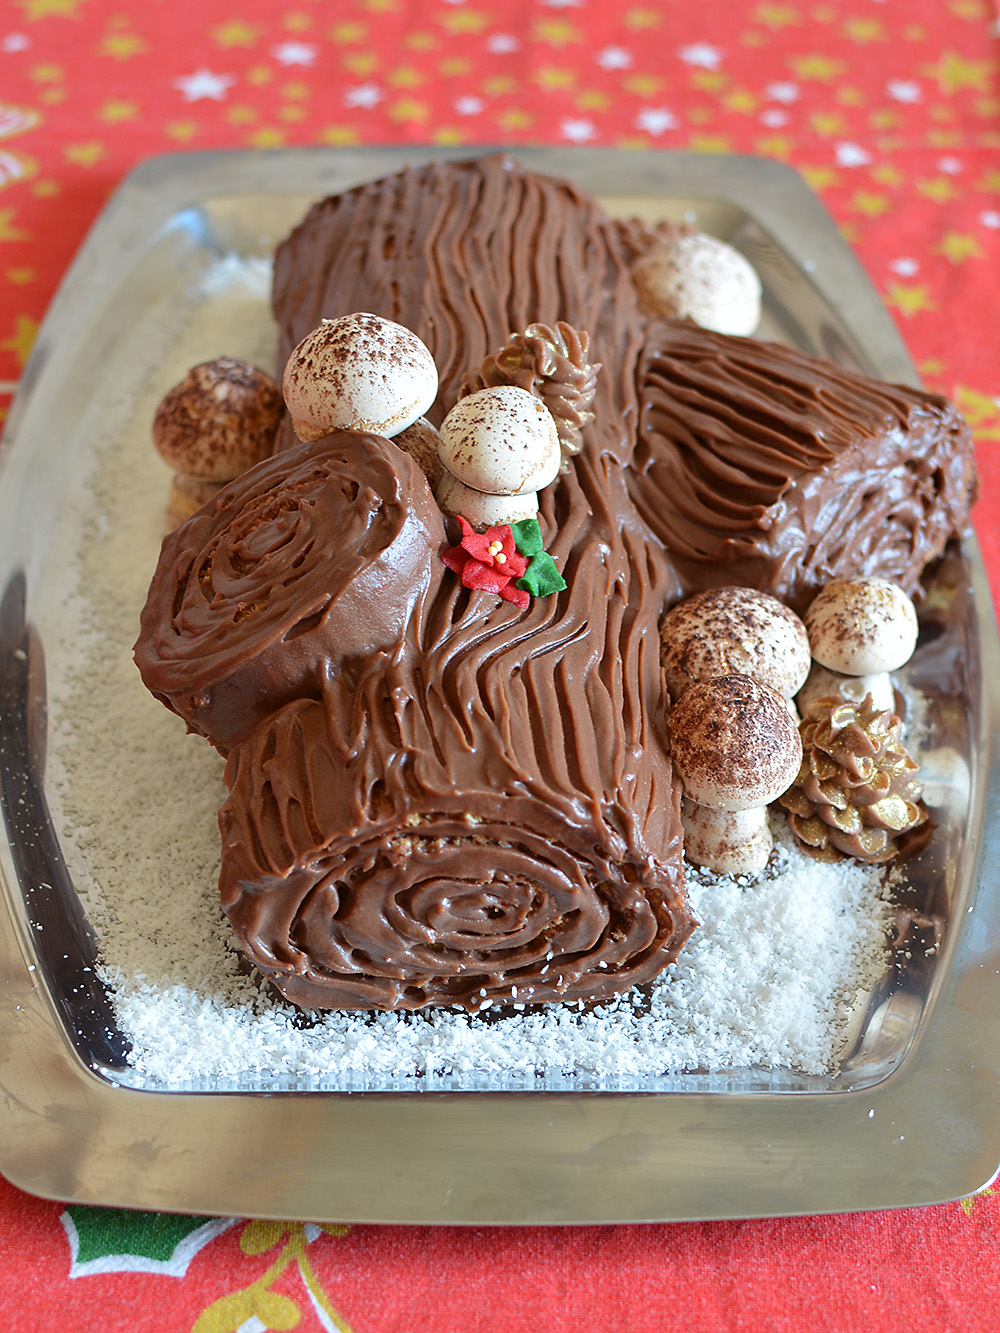 fatörzs torta képek Fatörzs torta   My Recipe Blog fatörzs torta képek